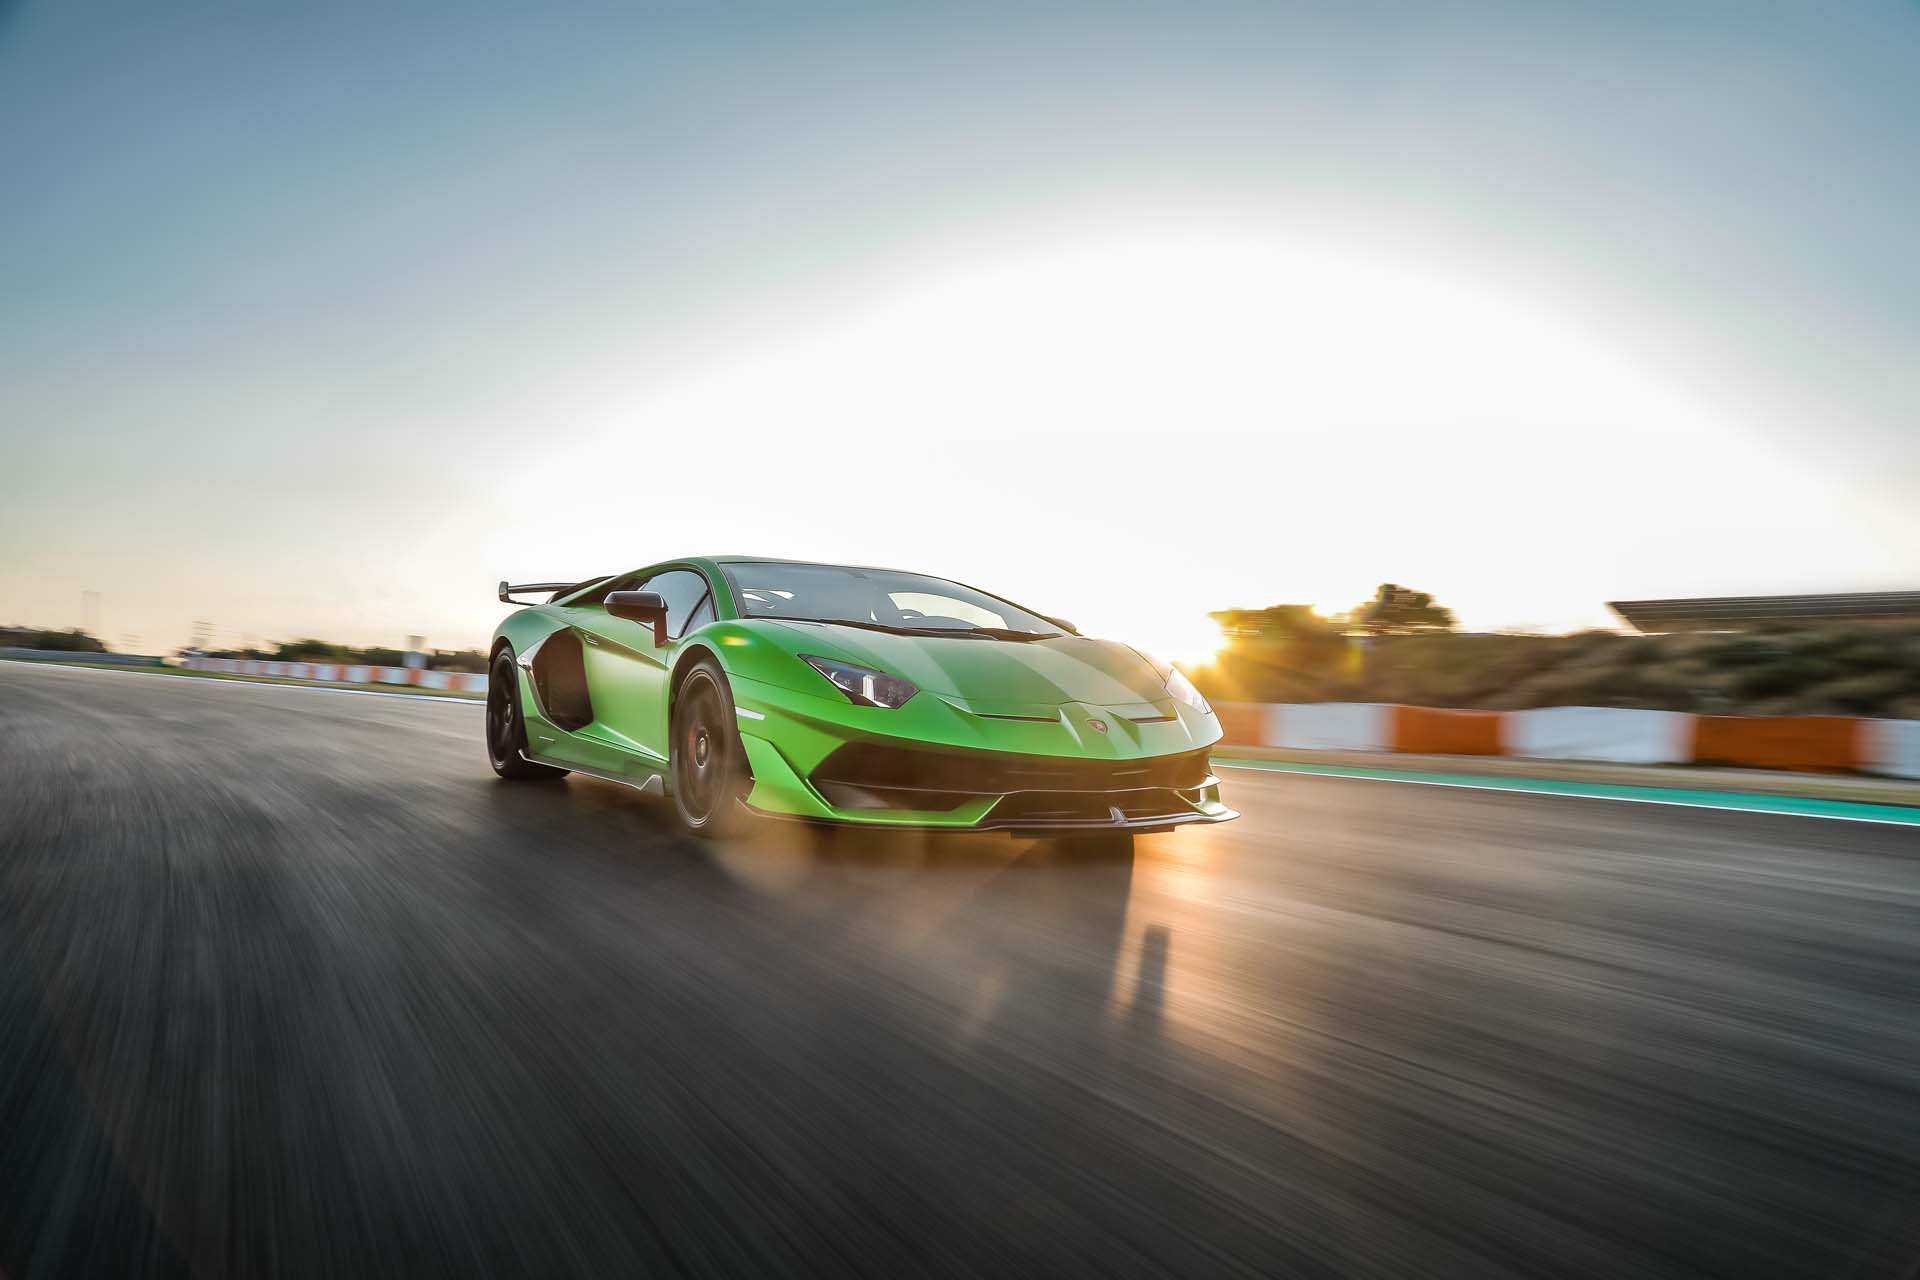 2019 Lamborghini Aventador SVJ Front Wallpapers #22 of 241